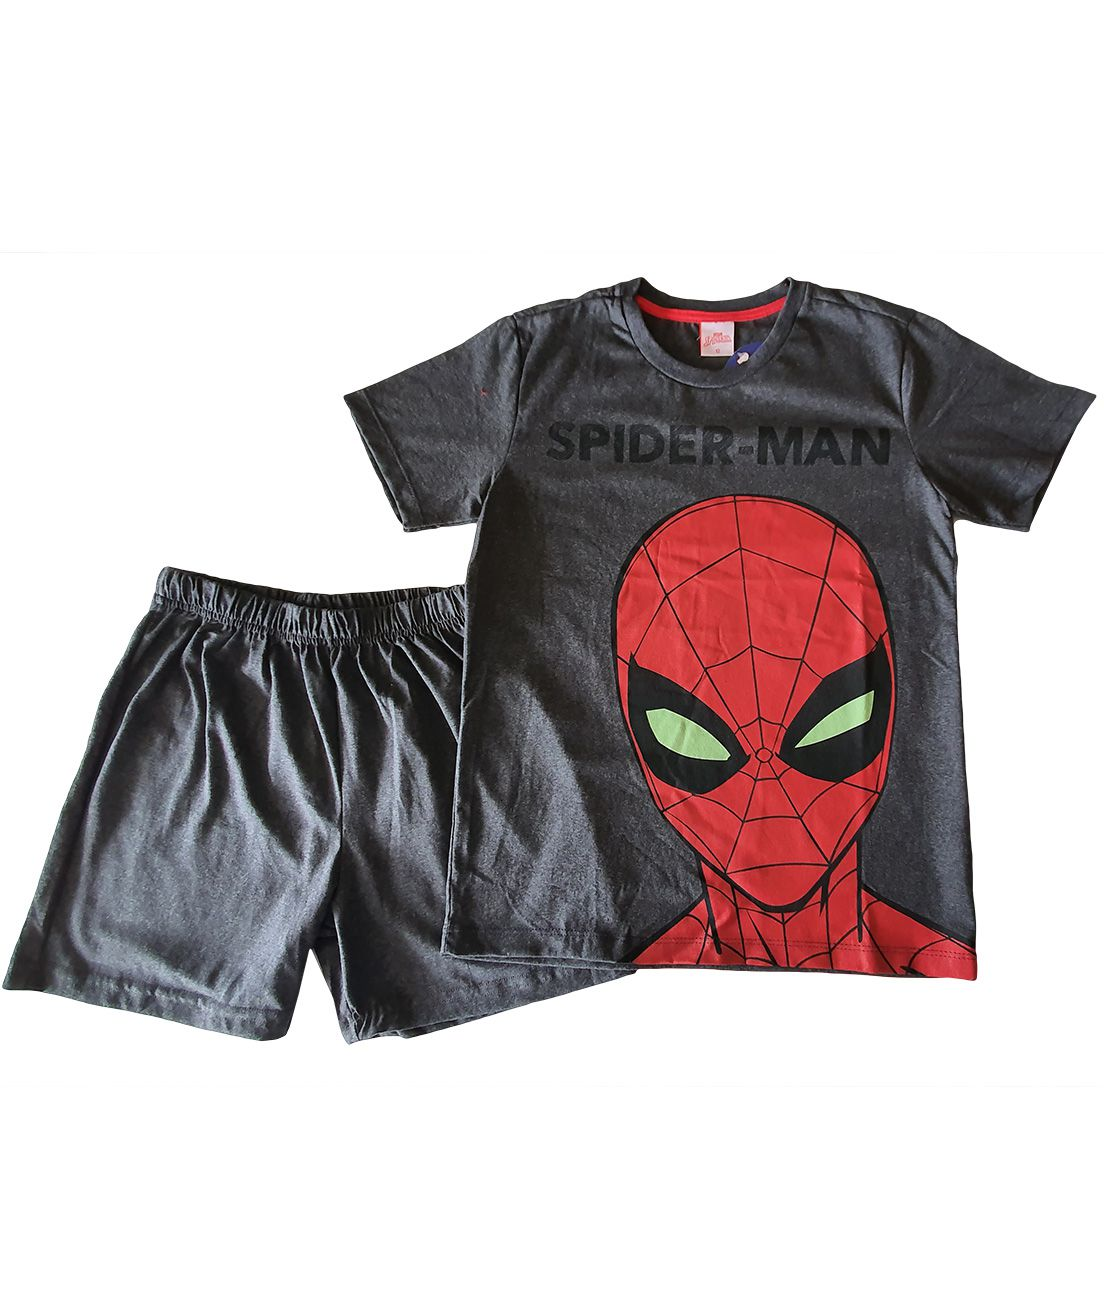 Pijama Juvenil Camiseta Manga curta e Shorts Evanilda  Spider Man Chumbo